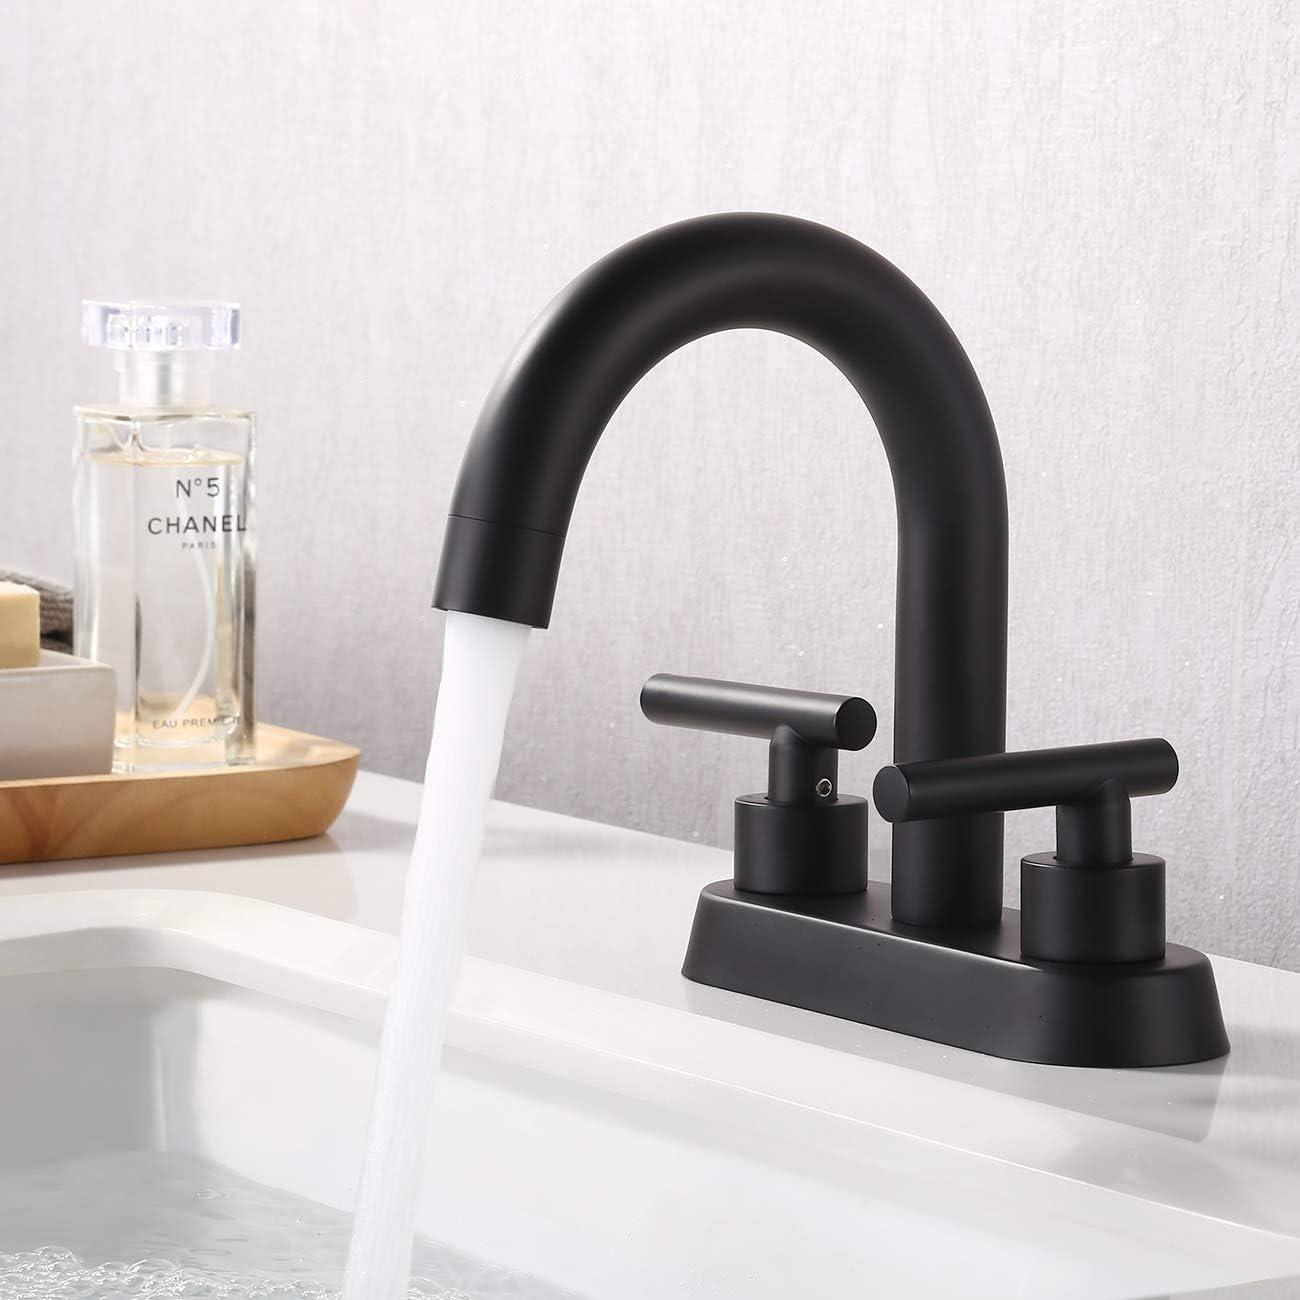 KES Matte Black Bathroom Faucet Modern 20 Inches Centerset Vanity Sink  Faucet Brass, Sink Drain Not Included, L20117LF BK